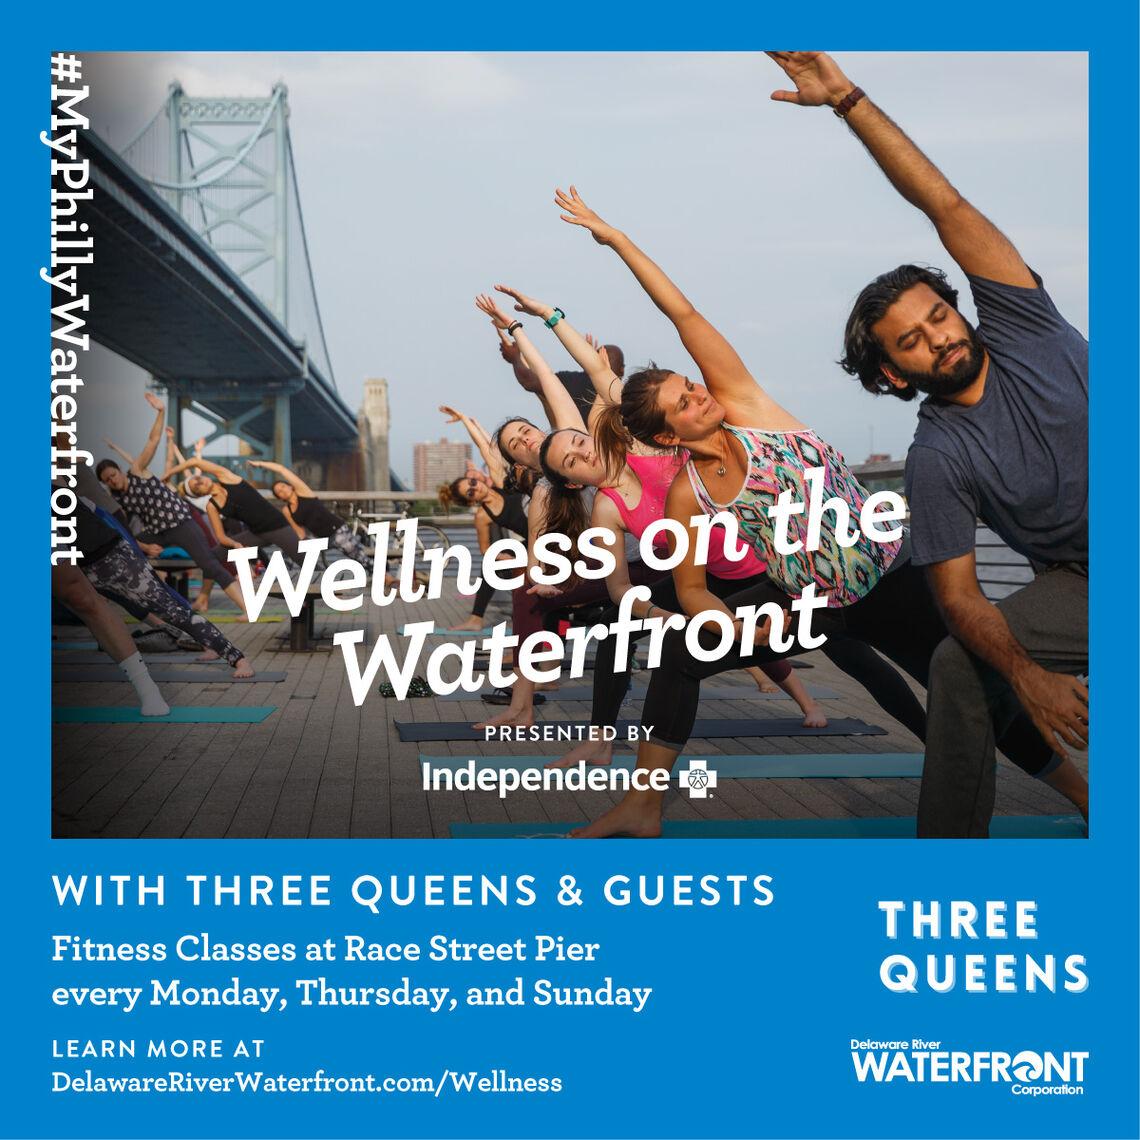 drwc summ21 wellnessonthewaterfront social